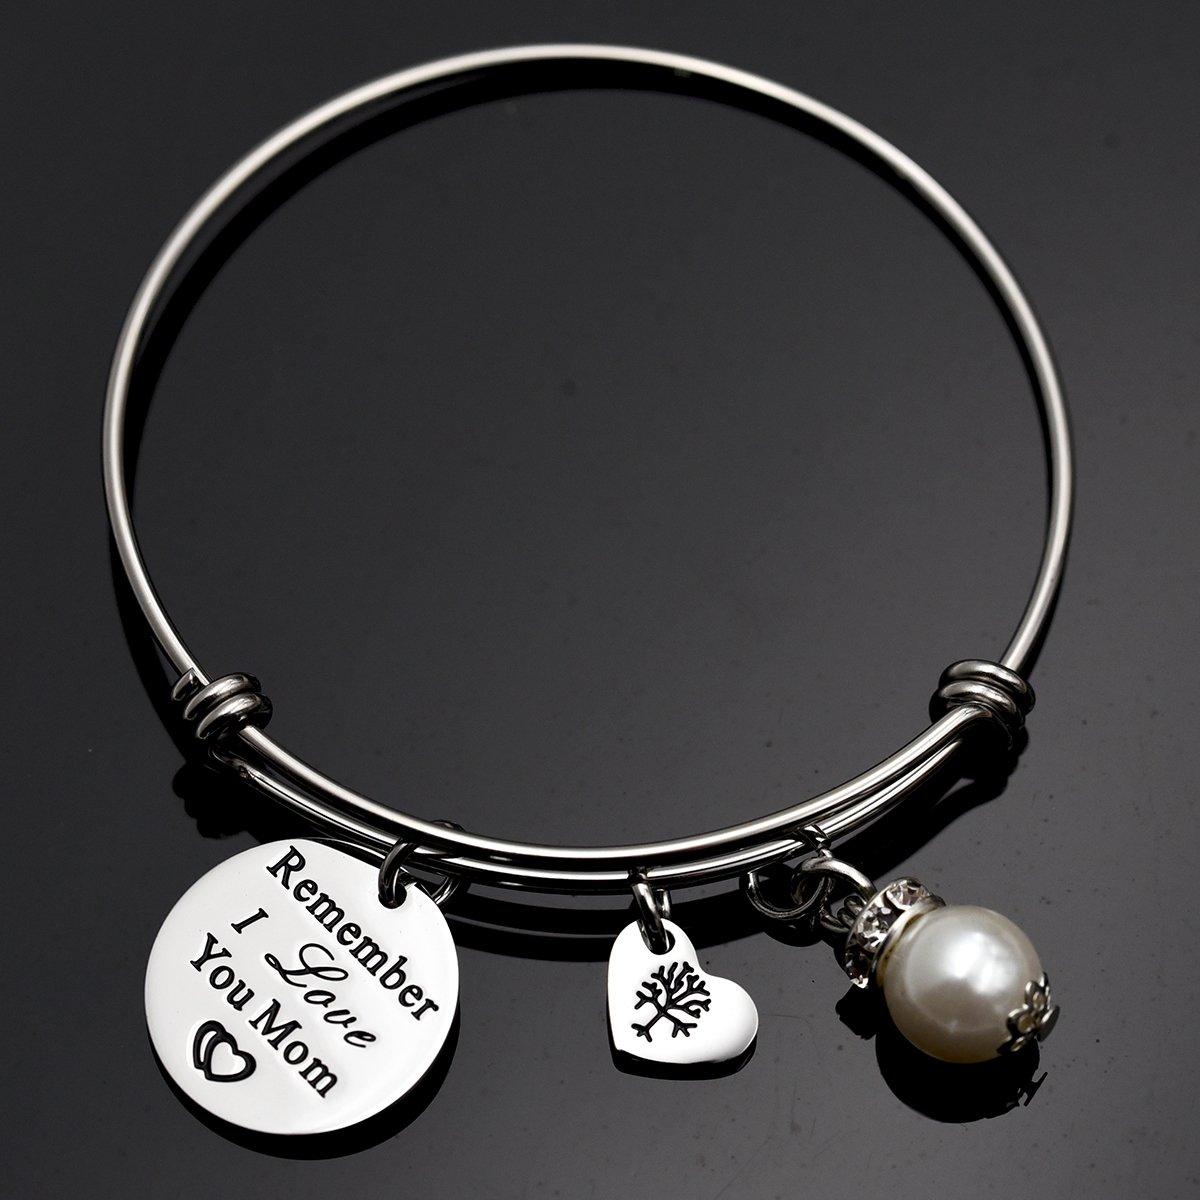 Remember I Love You Mom Bangle Bracelet (White) by LParkin (Image #4)